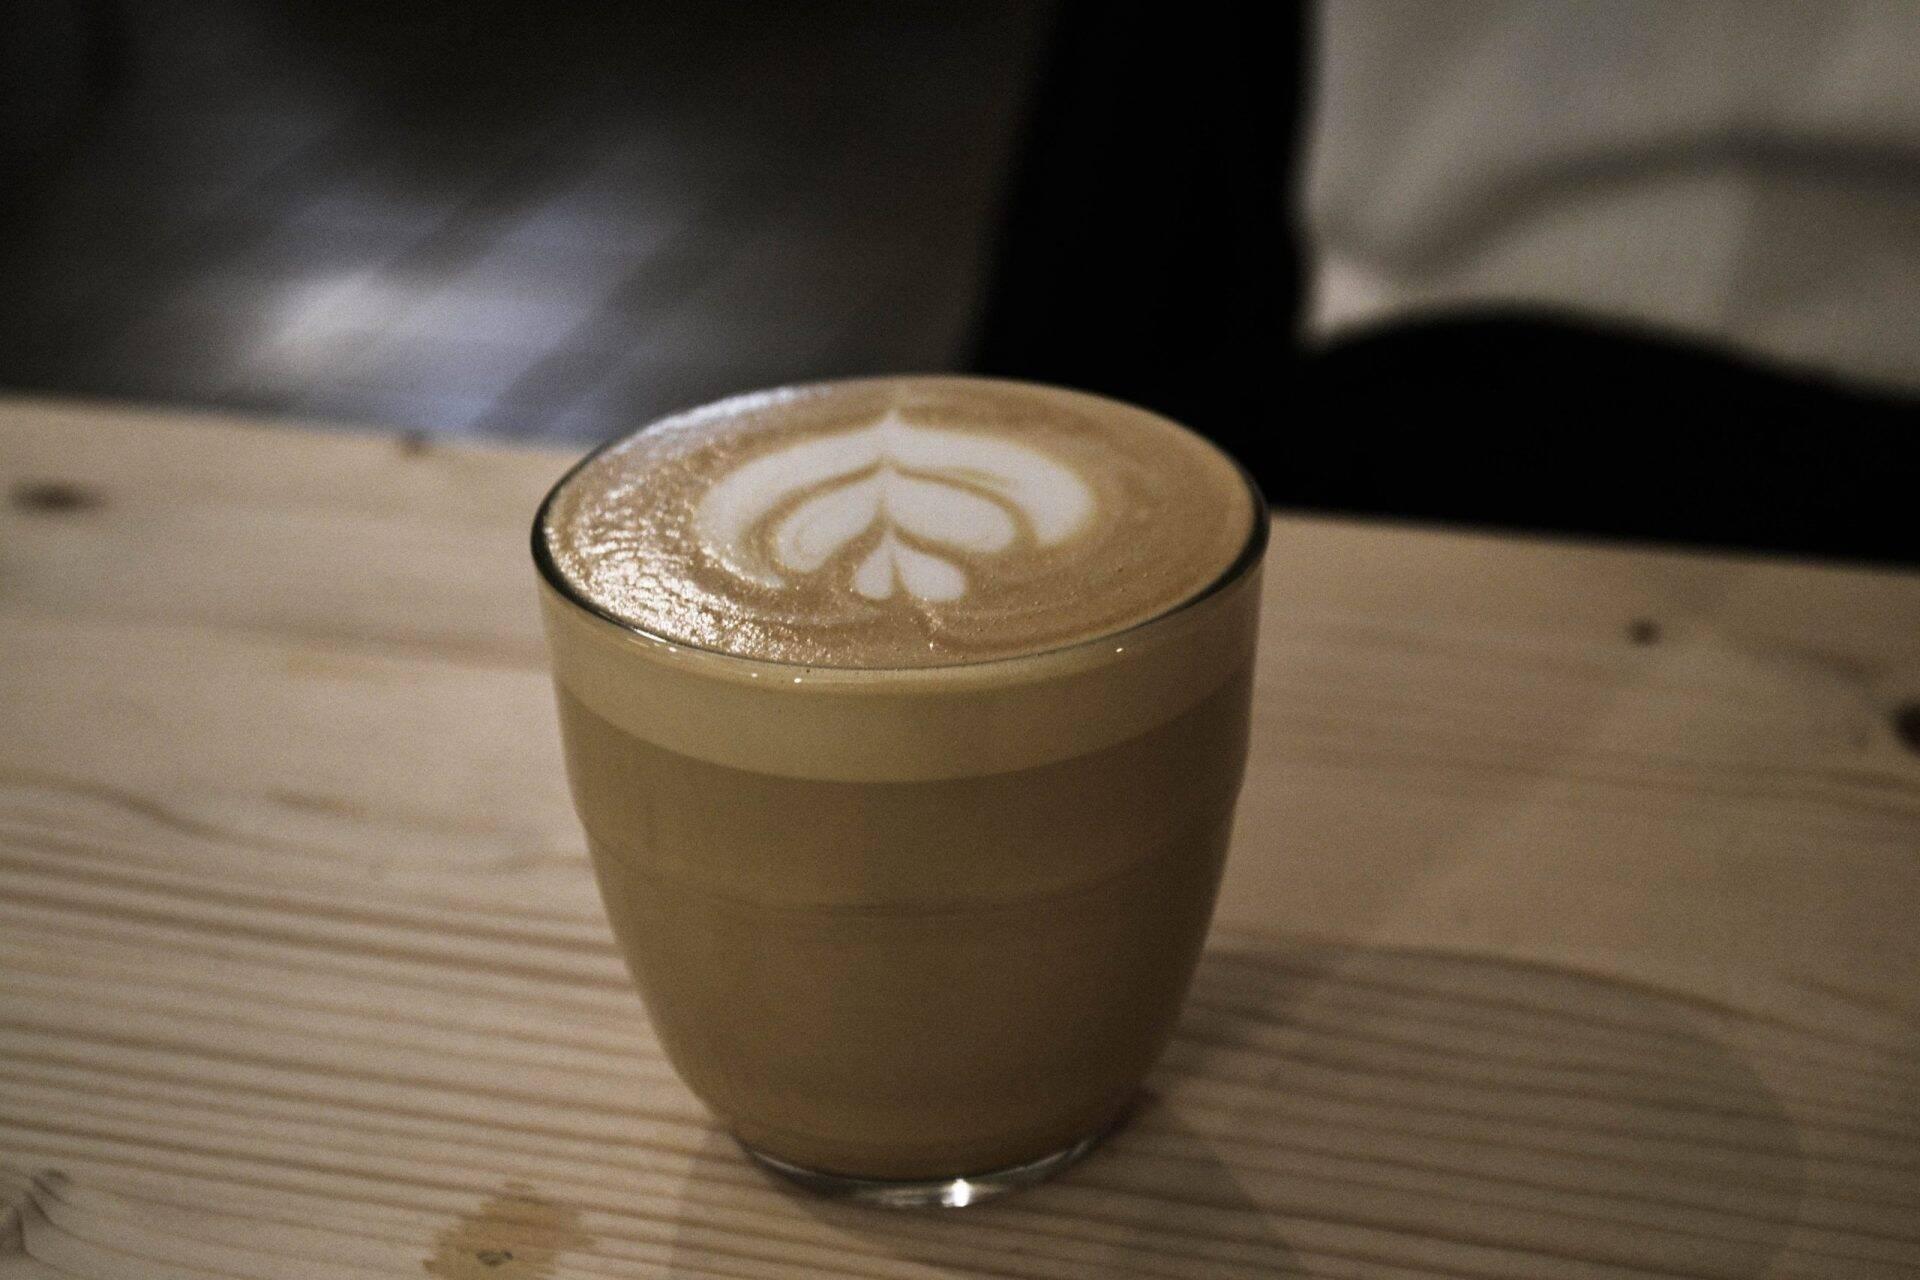 Darcy's Kaffe in Kopenhagen